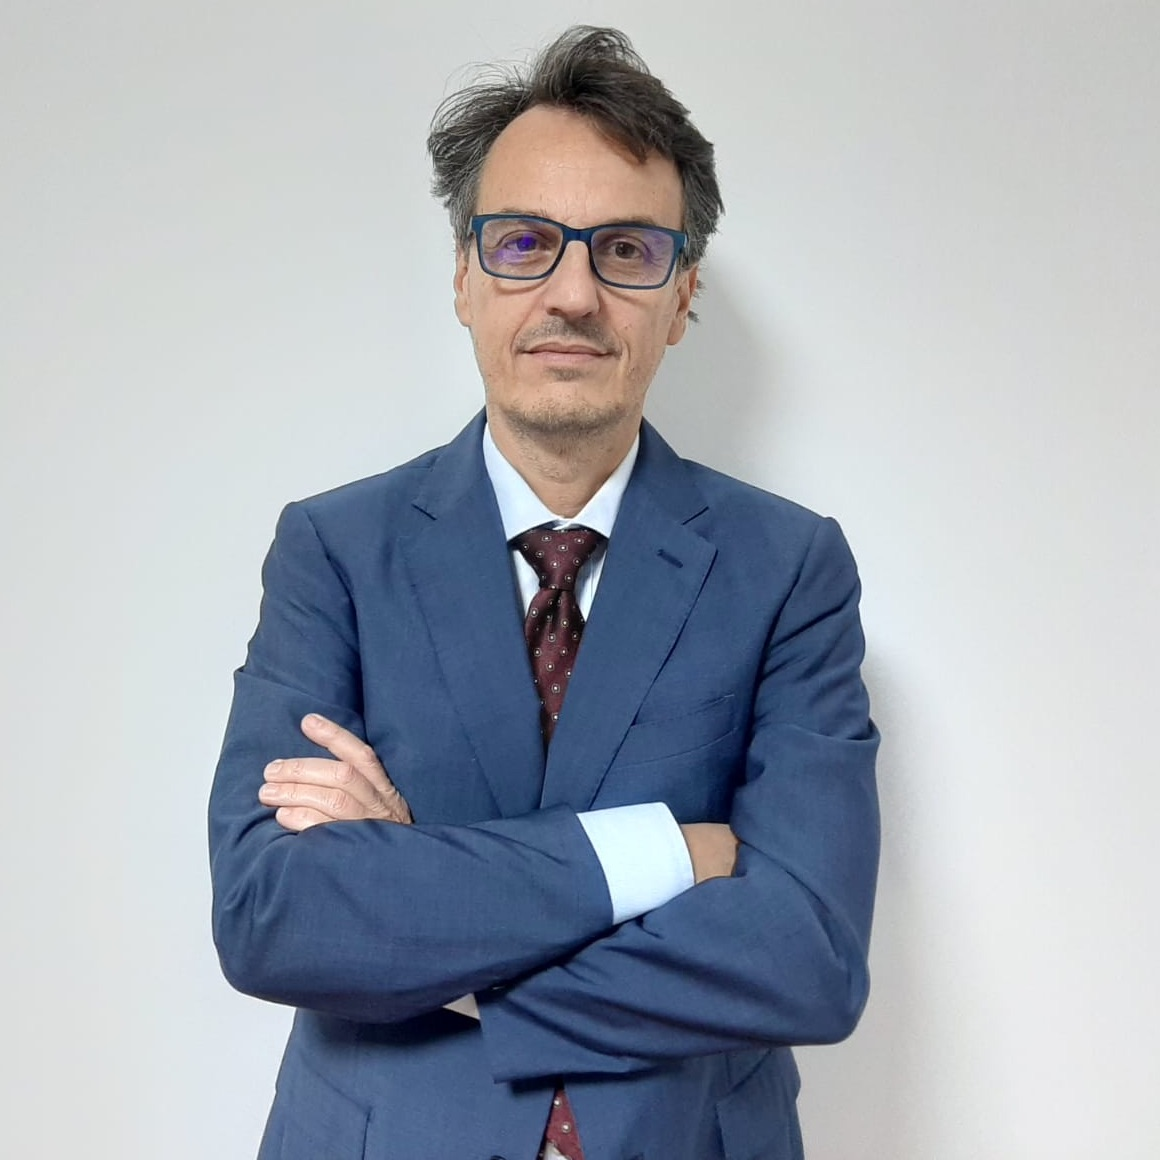 Paolo Scalzo